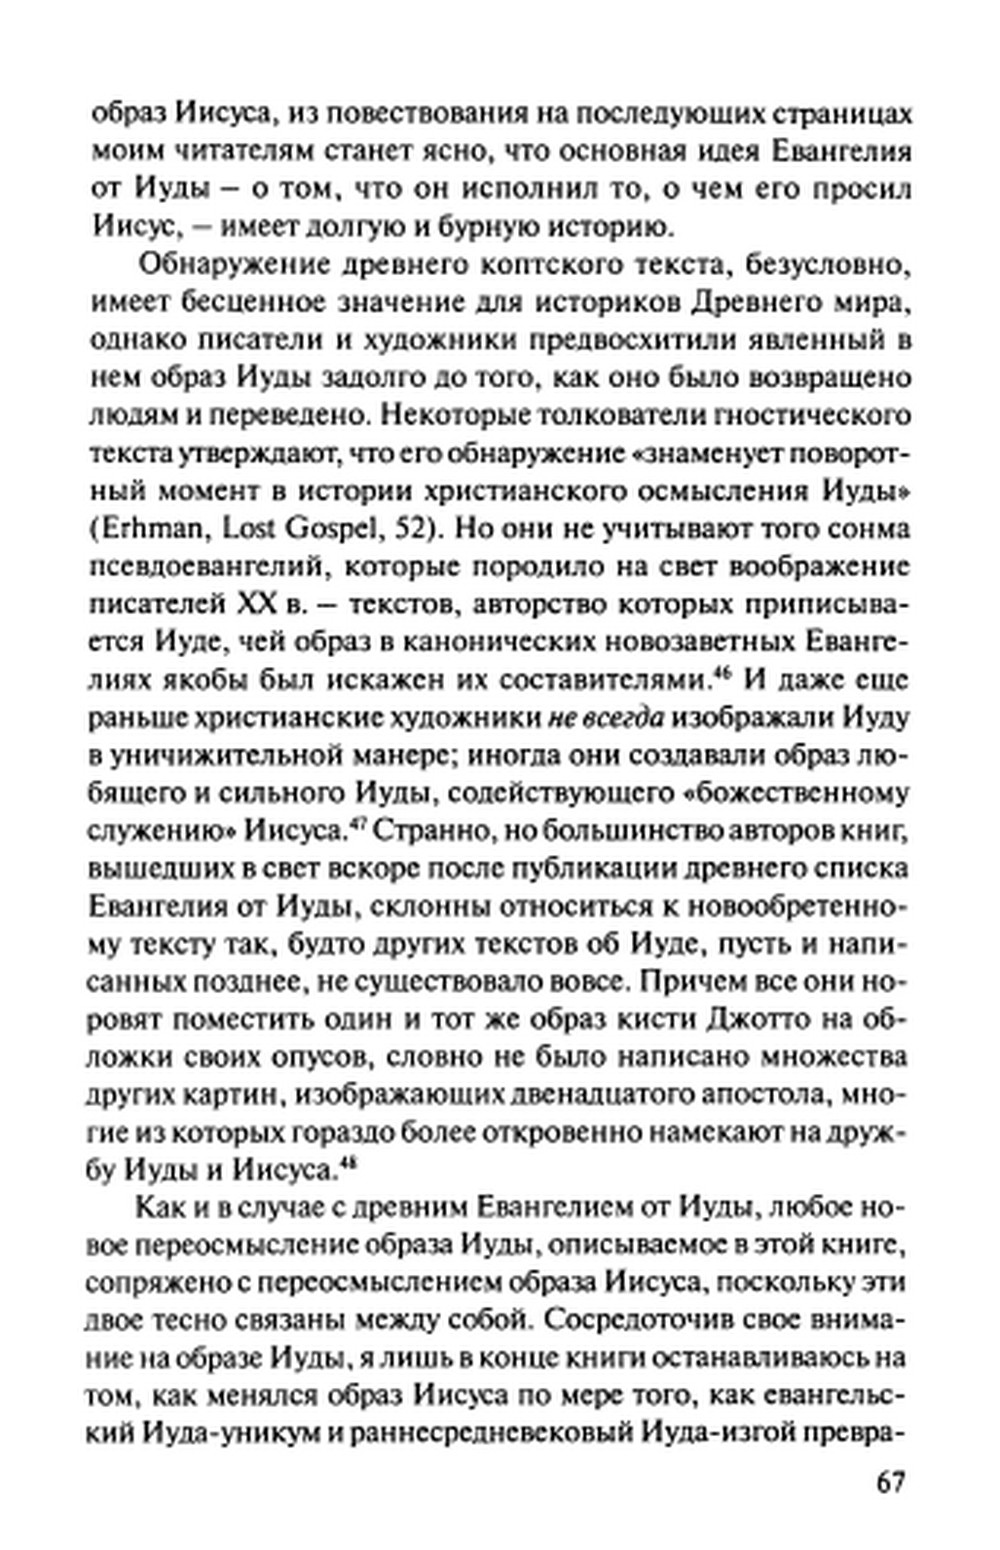 http://i1.imageban.ru/out/2013/10/02/c1a9980ed63d02f7f411ea7aa67ee129.jpg